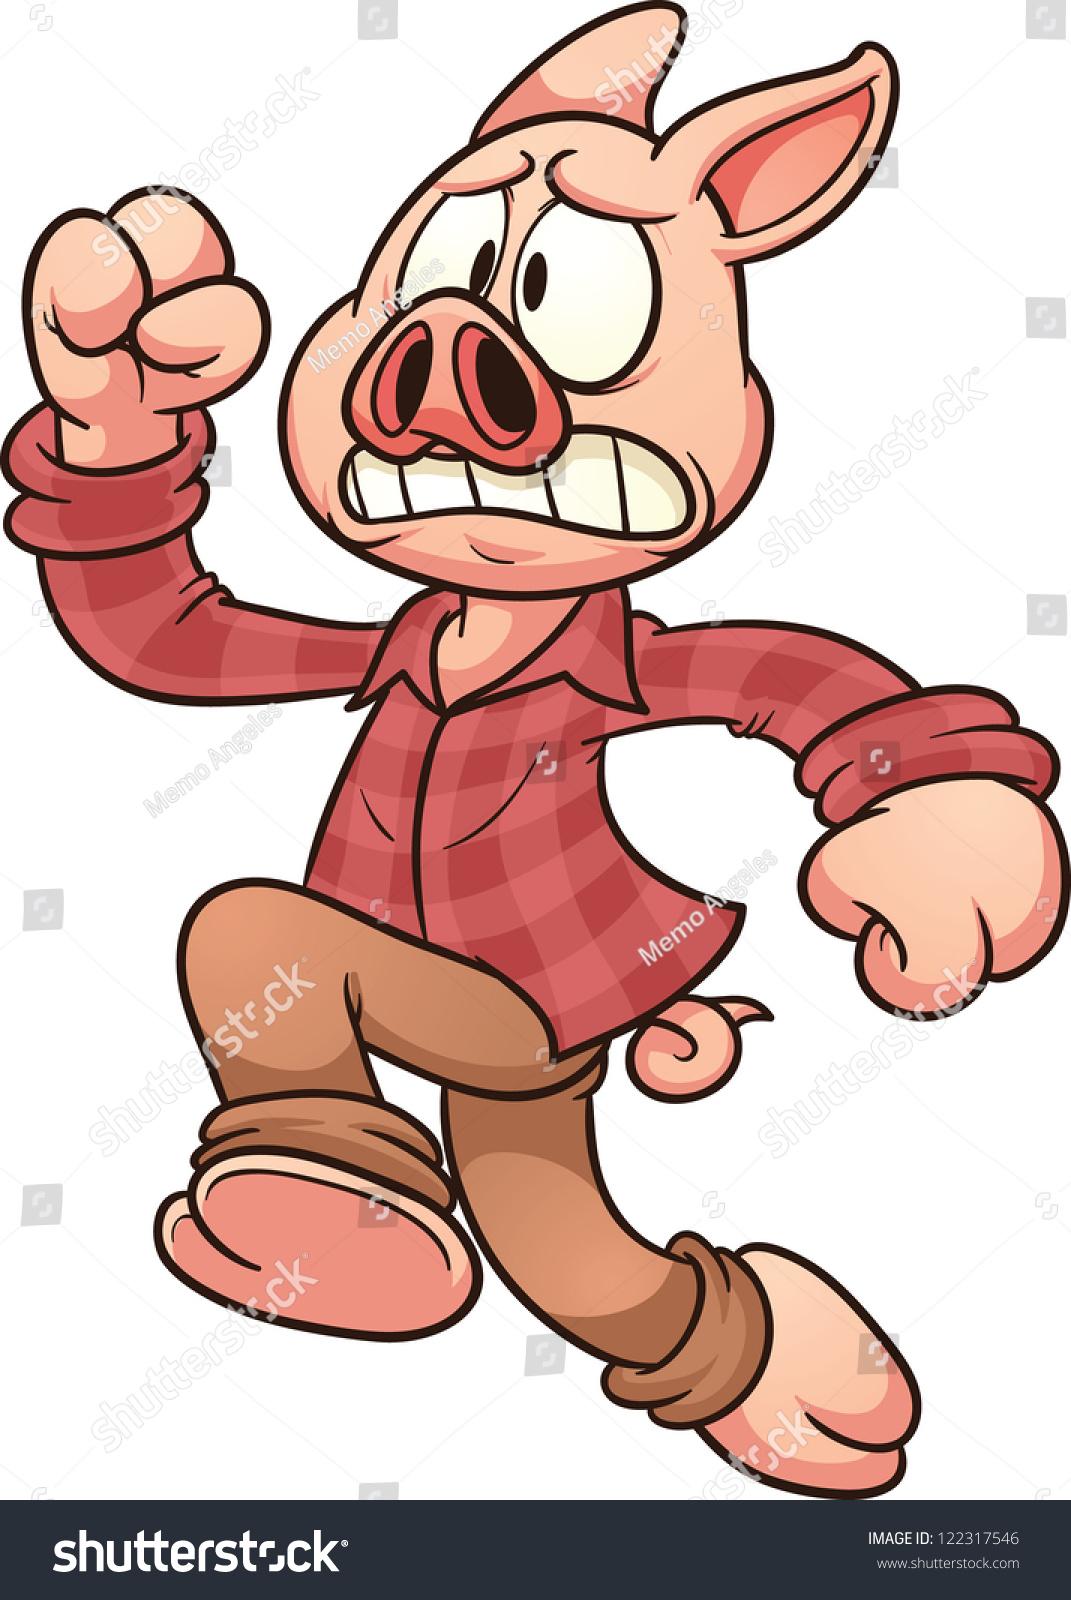 Woman and pig videosex cartoon videos